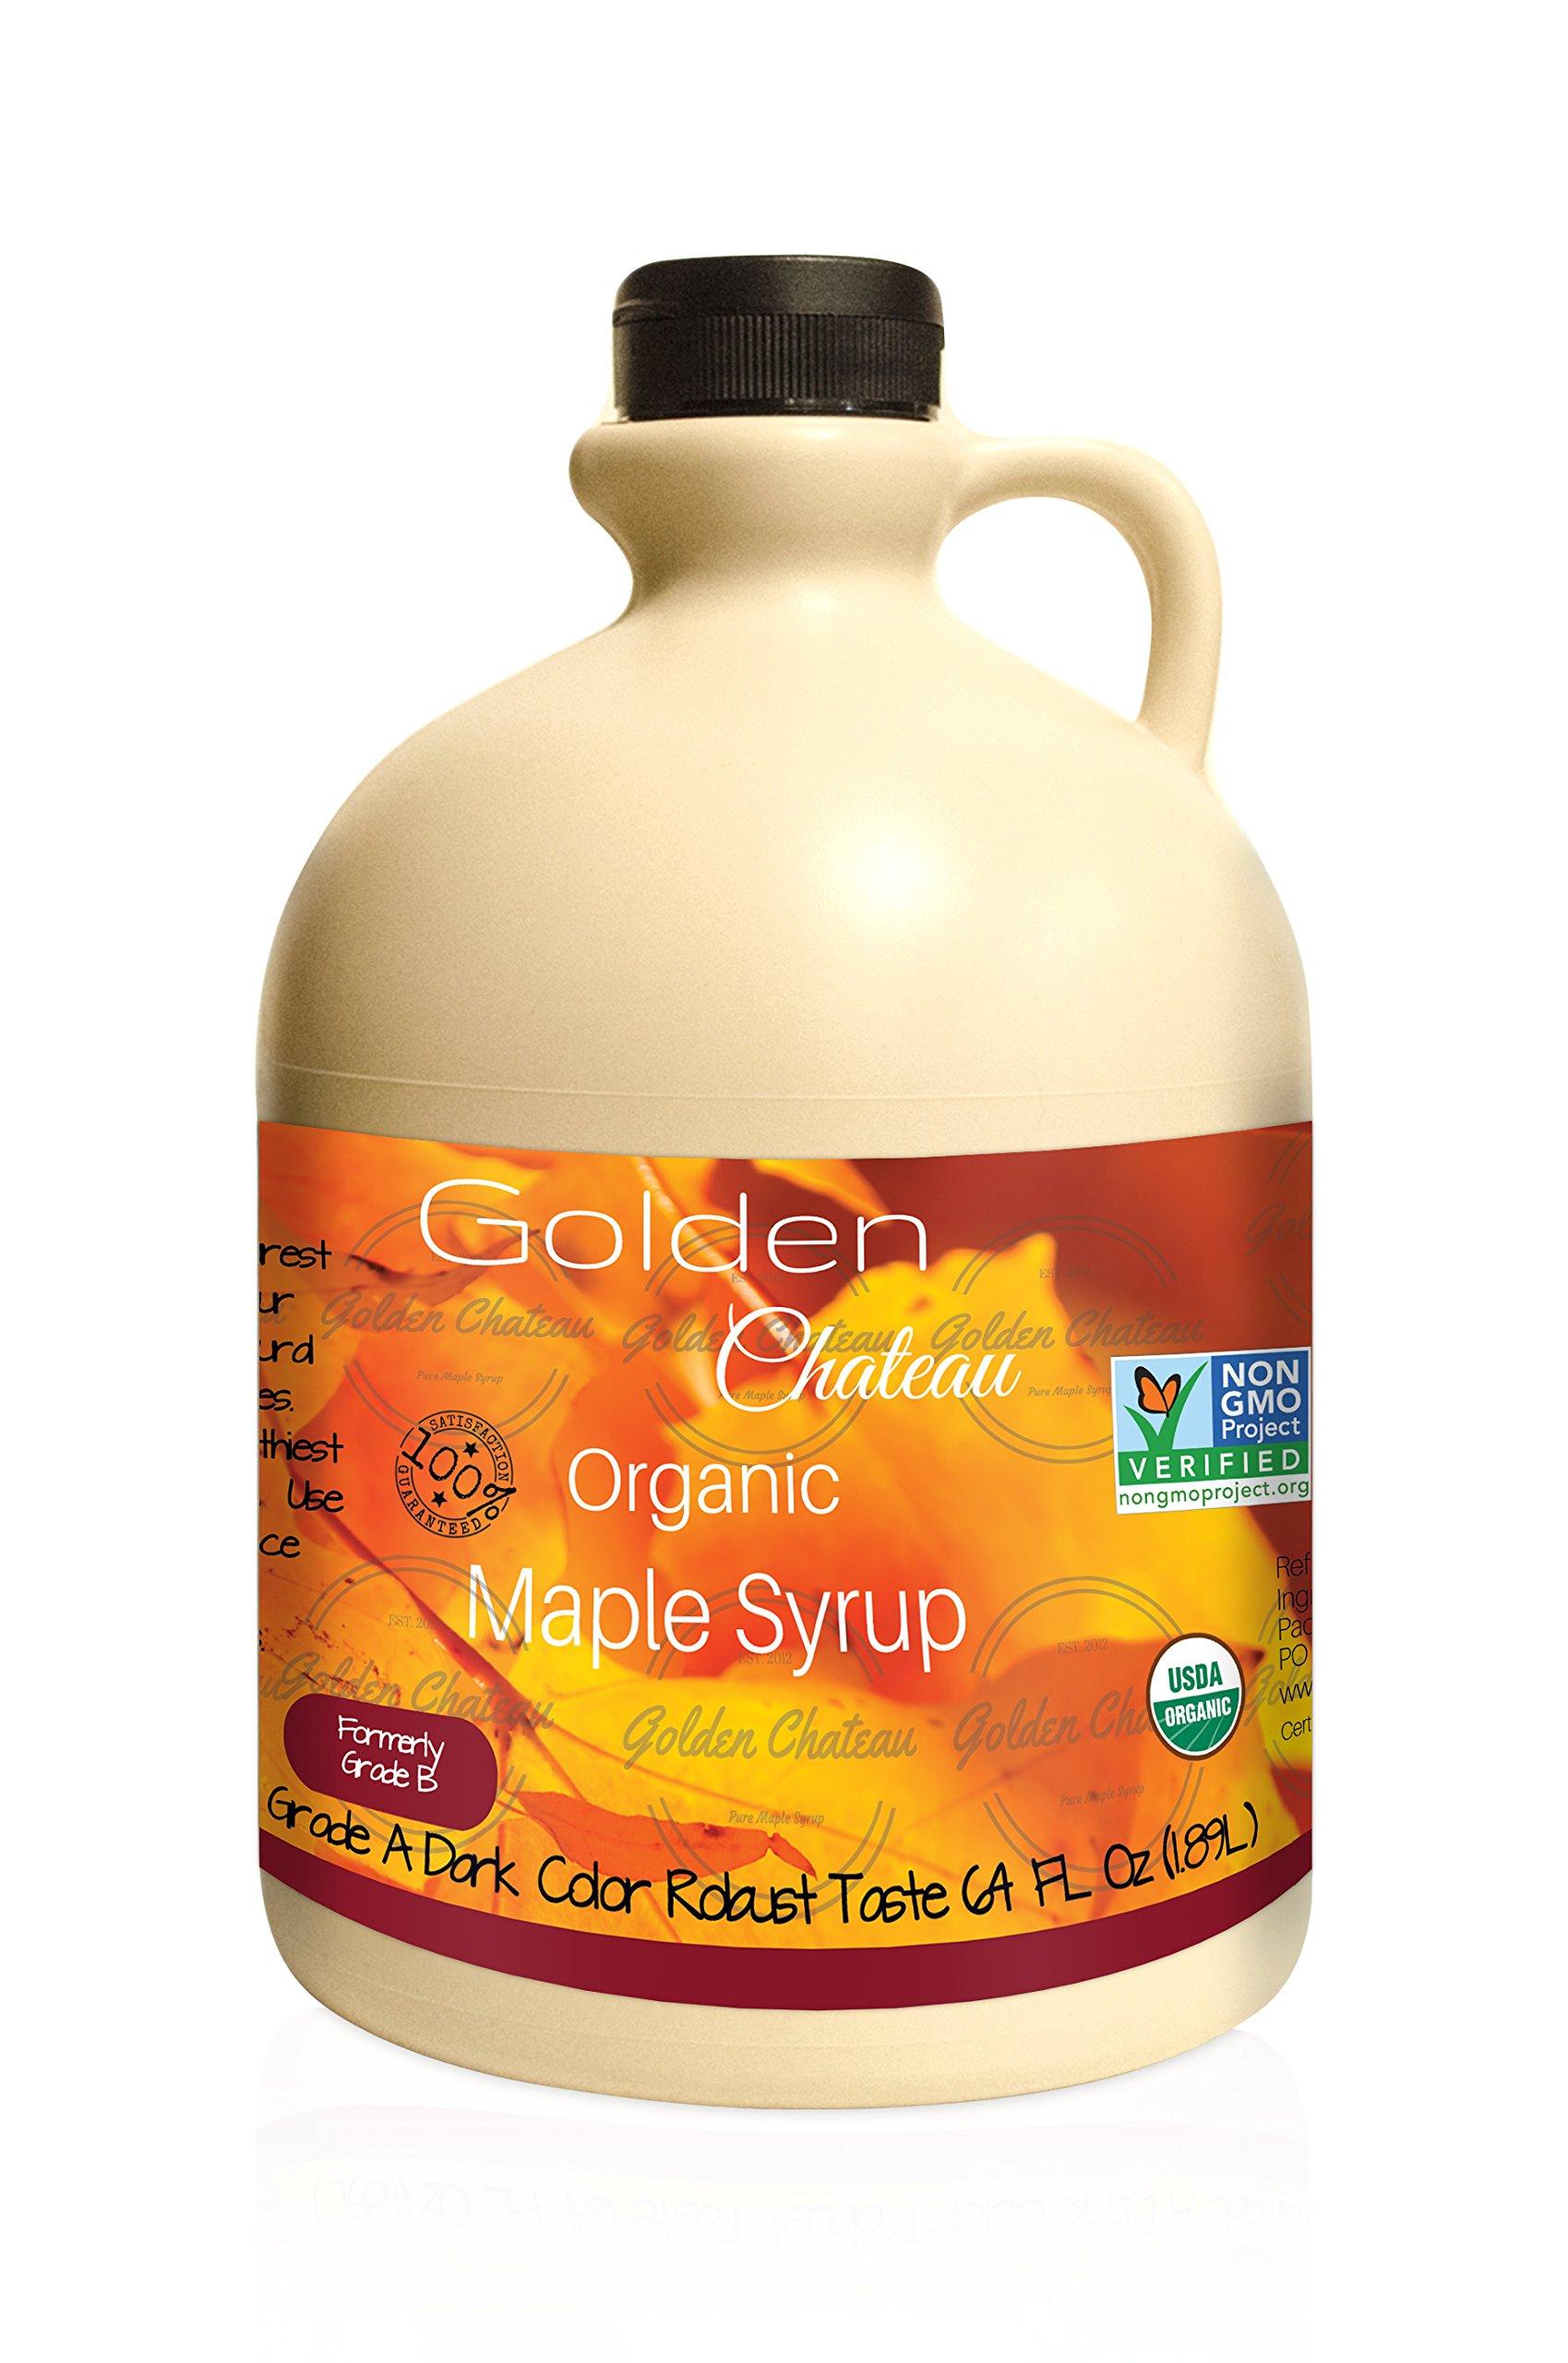 Golden Chateau Organic Maple Syrup Grade A Dark Color Robust Taste/formerly Grade B, 64 oz